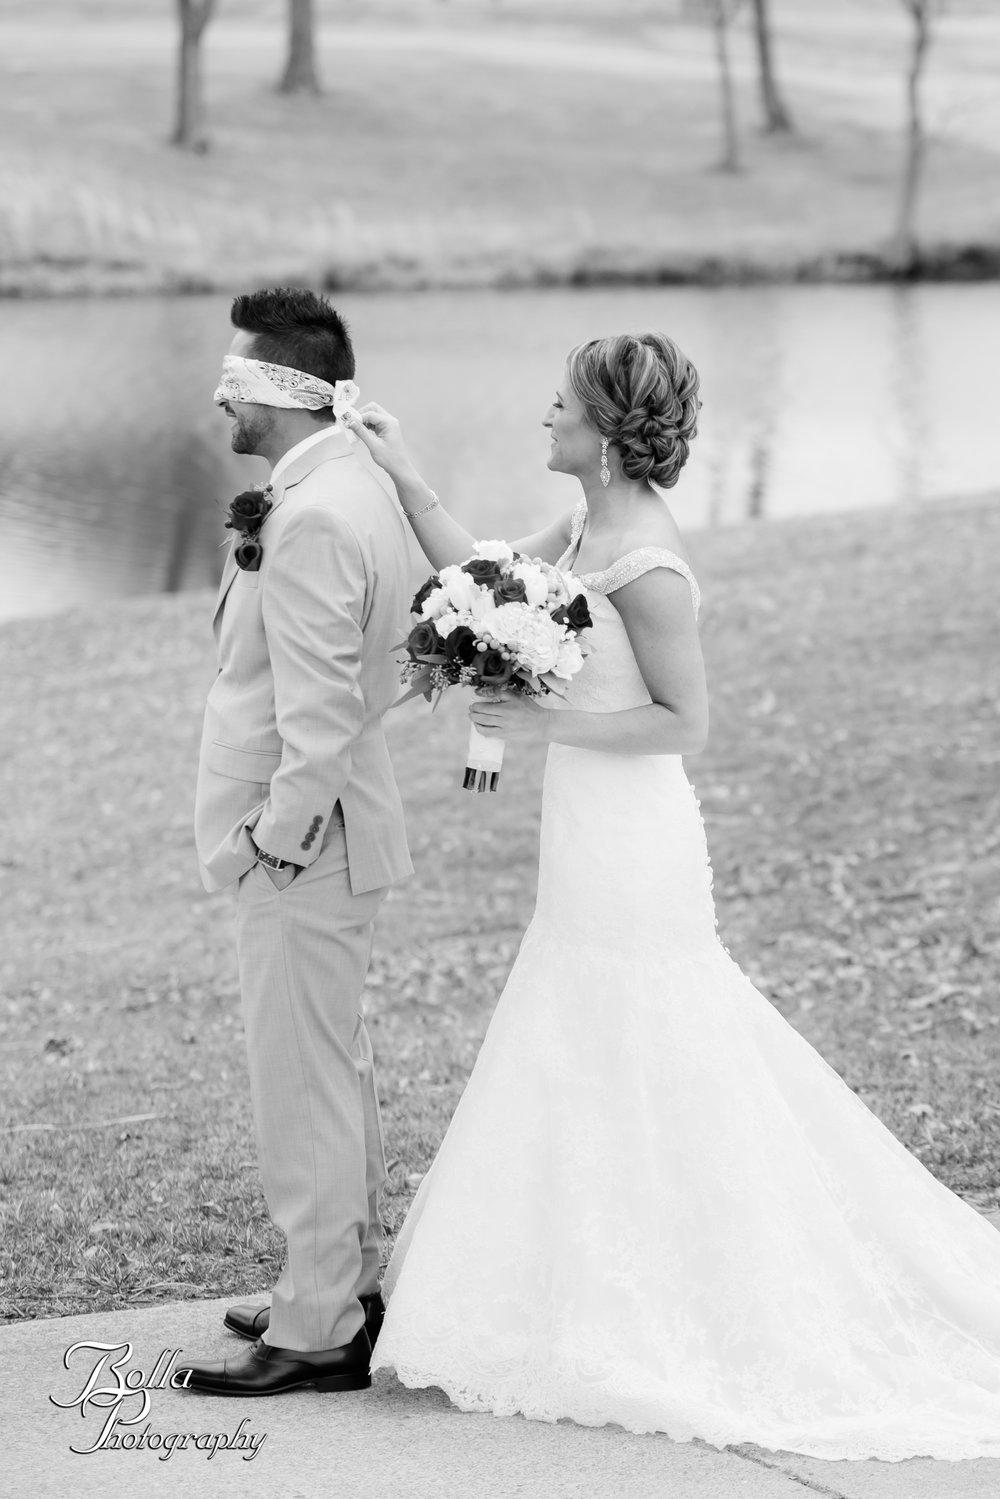 Bolla_photography_edwardsville_wedding_photographer_st_louis_weddings_highland_Allen_Warren_winter_red-0099.jpg